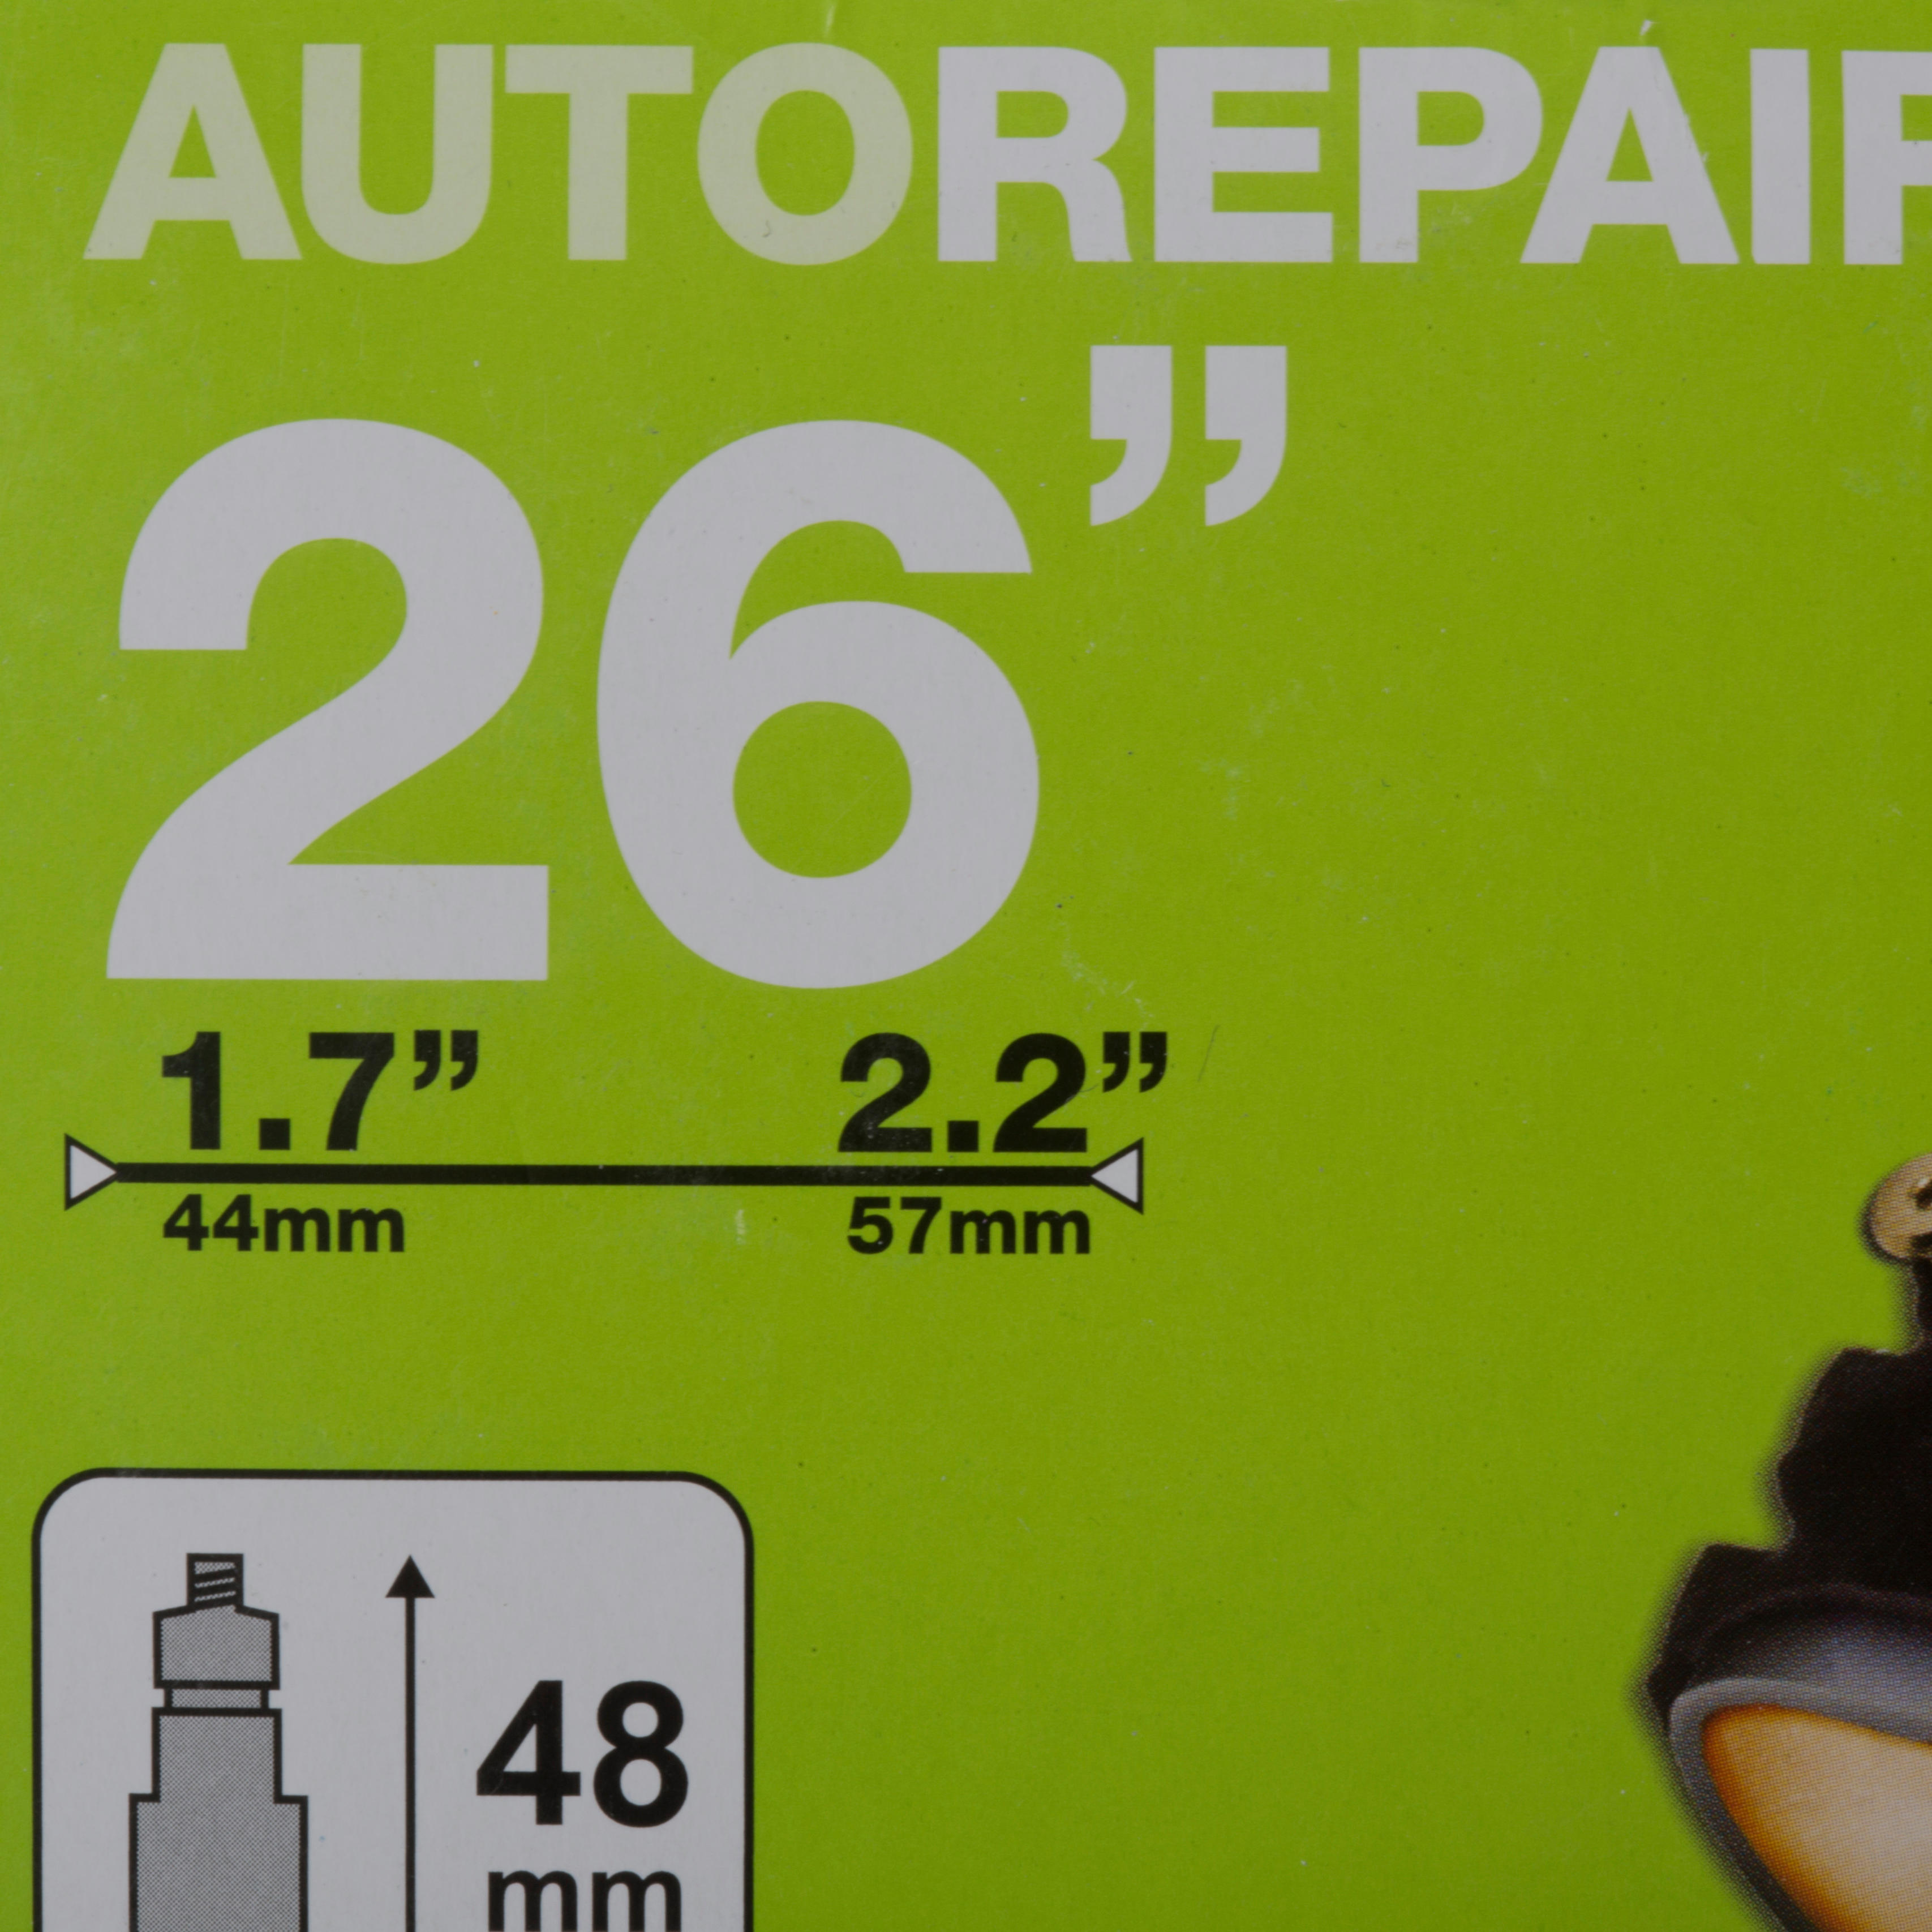 ATC 26x1.7 / 2.2 48 mm Presta Valve Self-Repairing Inner Tube